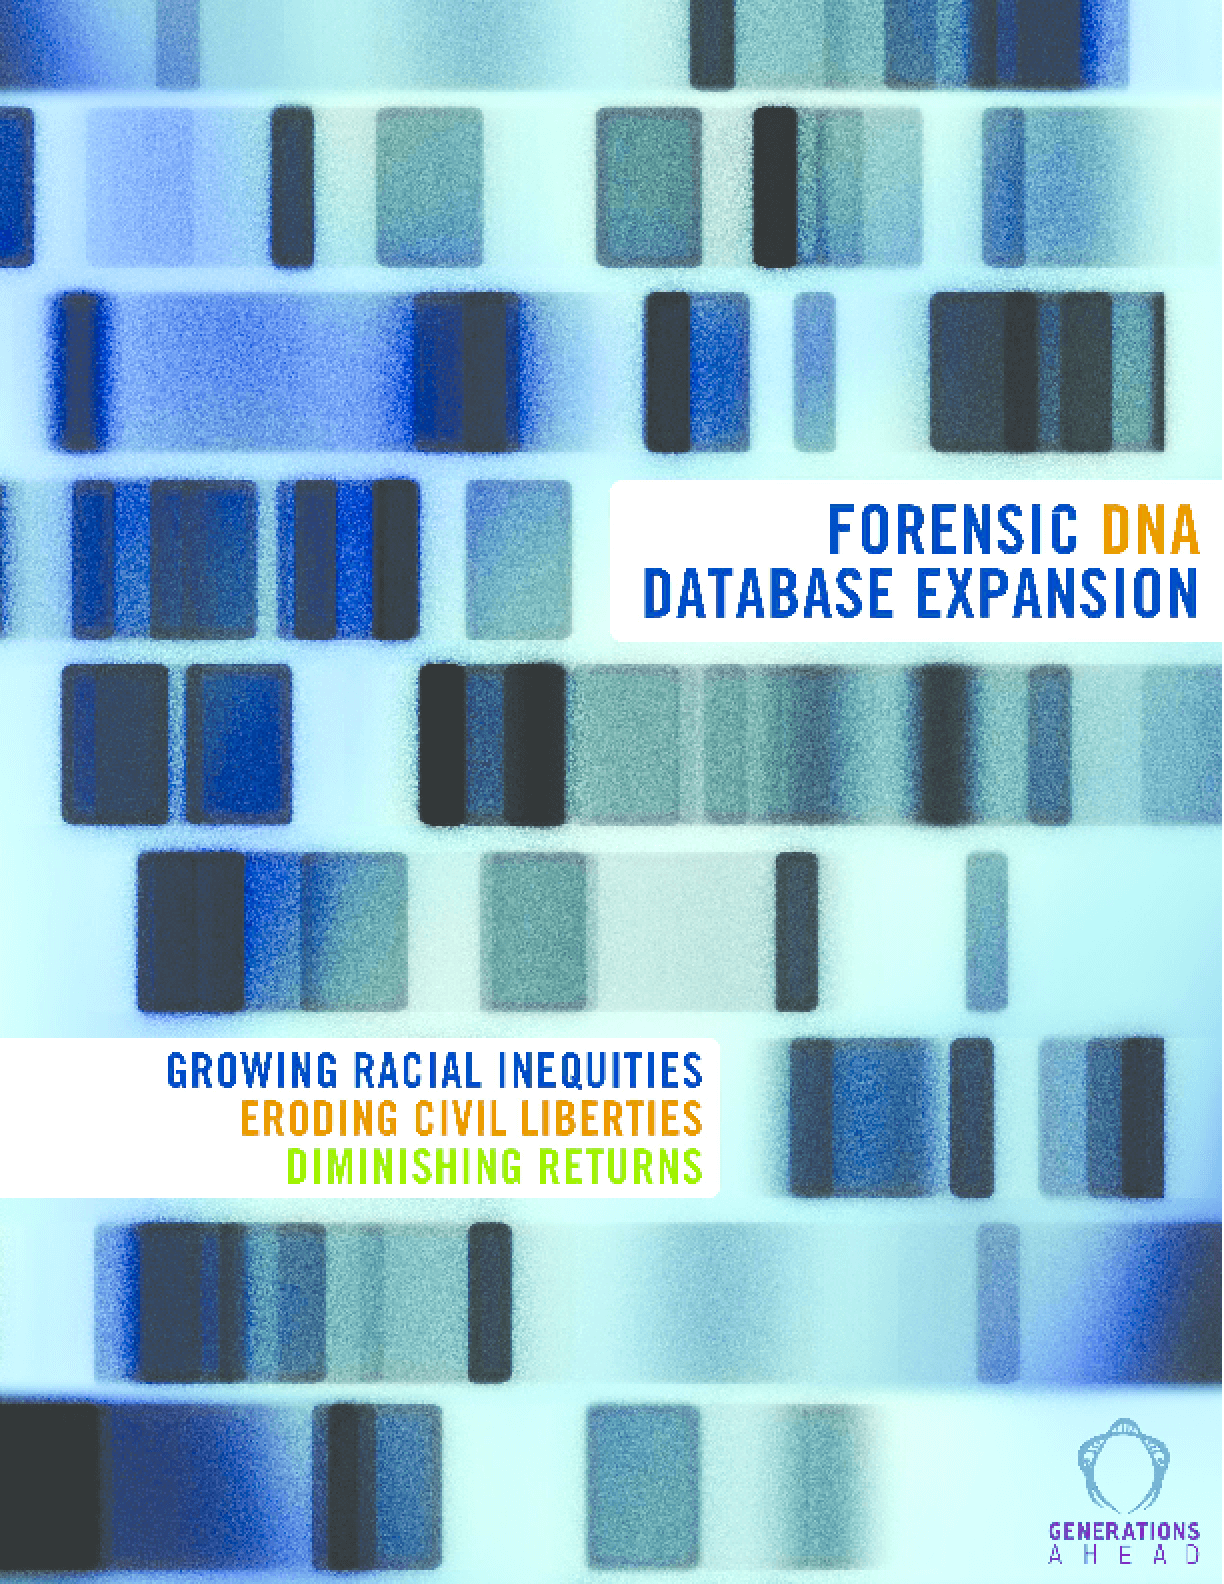 Forensic DNA Database Expansion: Growing Racial Inequities, Eroding Civil Liberties, Diminishing Returns